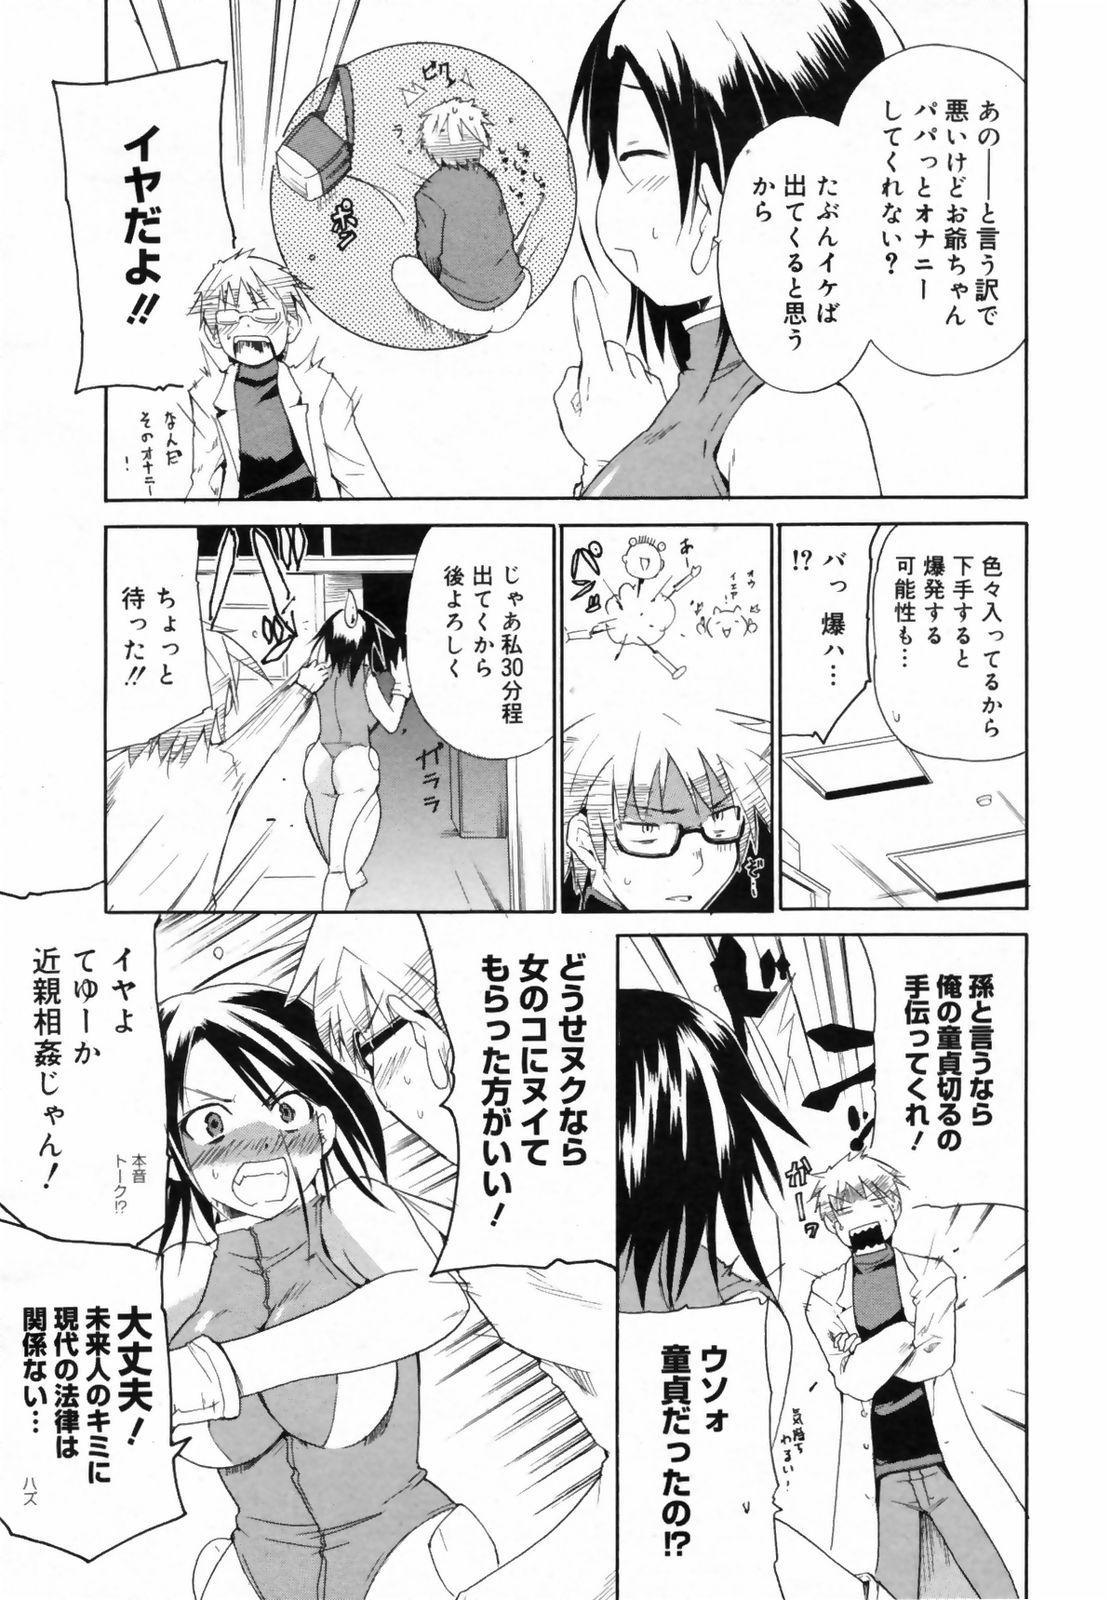 Manga Bangaichi 2009-02 Vol. 234 64